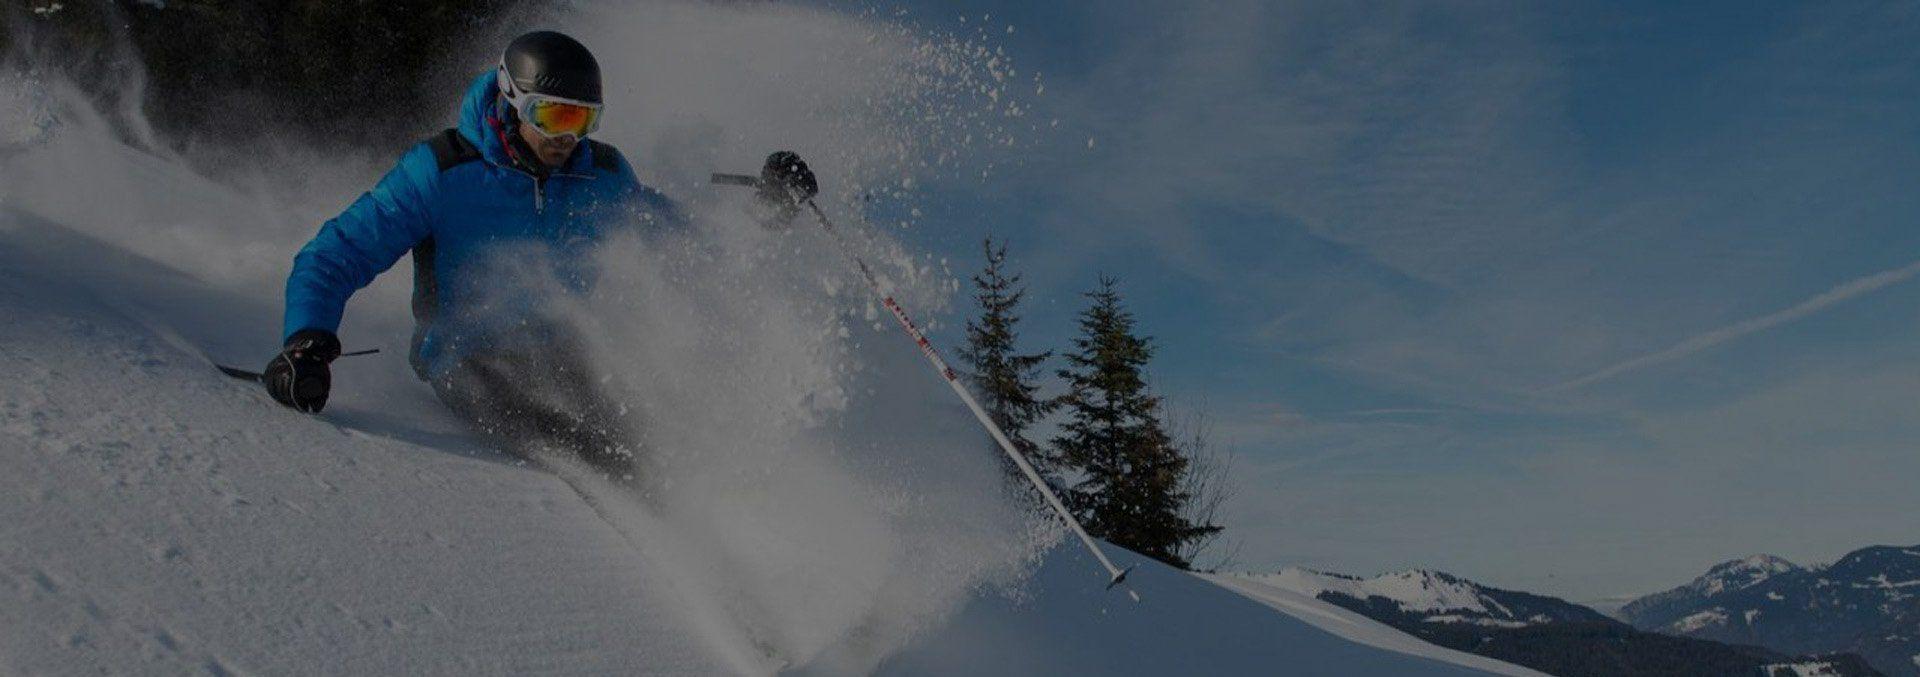 http://skirentalroccaraso.it/assets/images/slidermaster/slide1dark.jpg